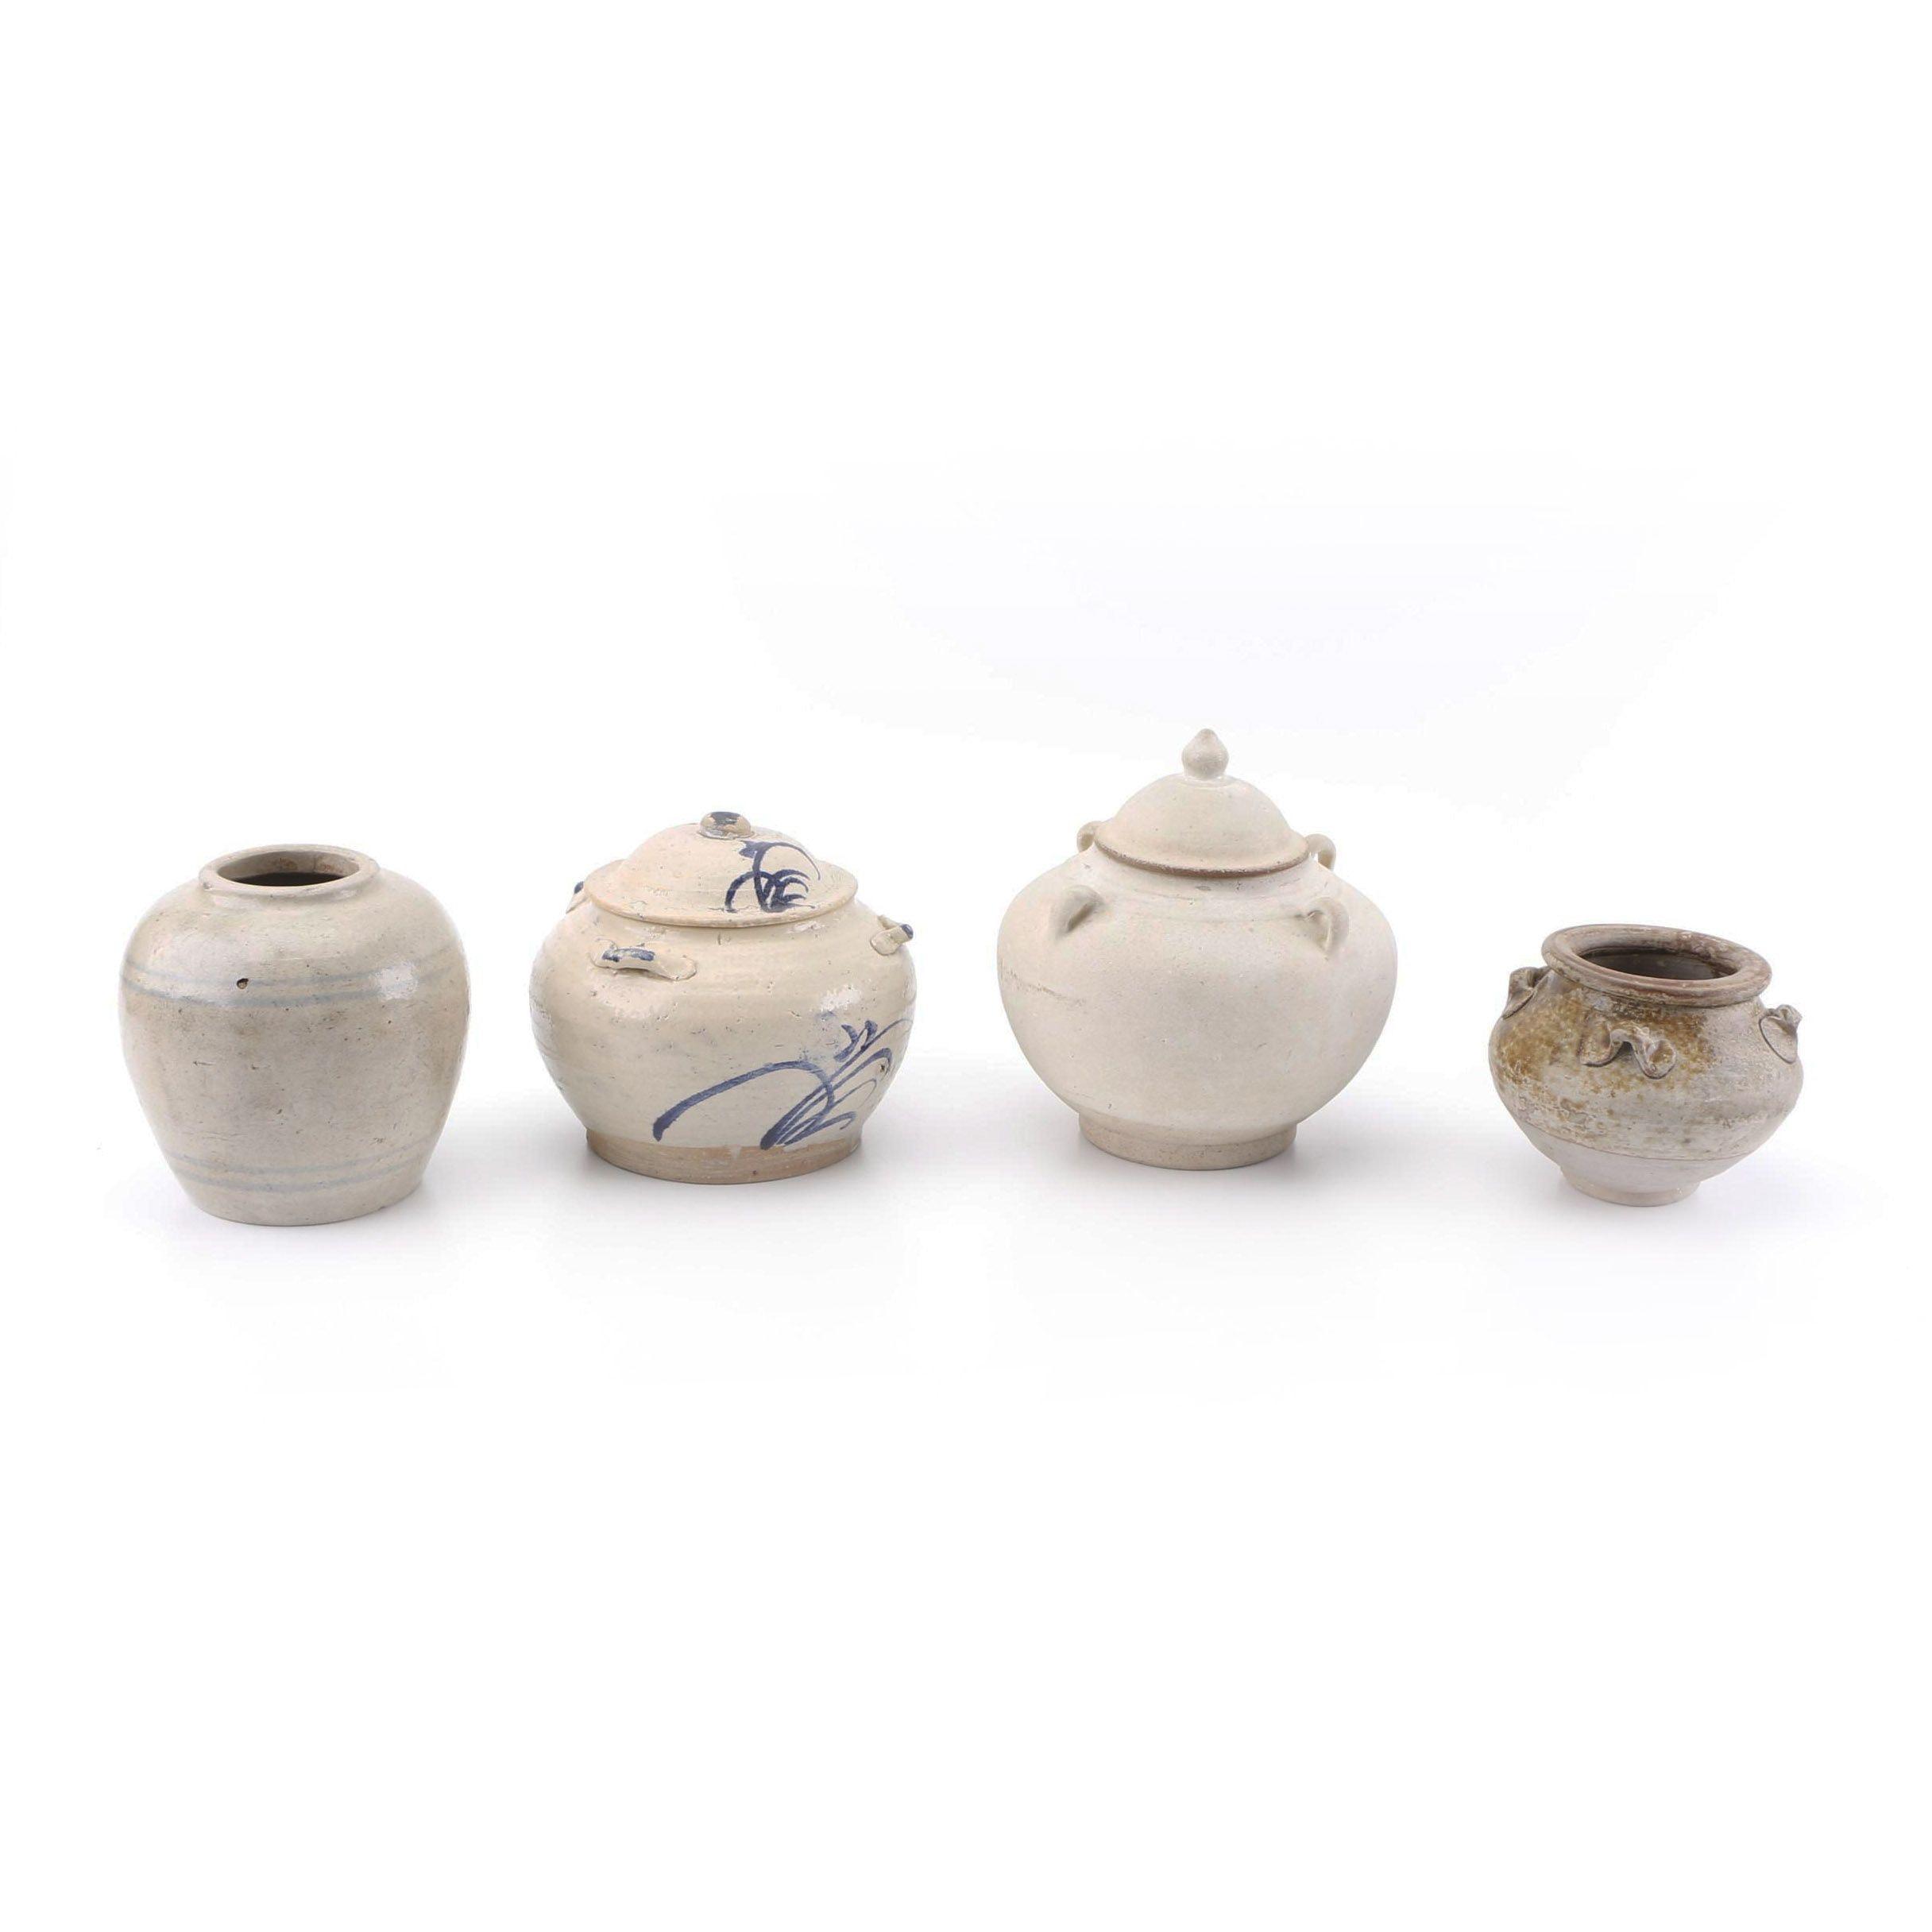 Hand-Thrown Stoneware Jars and Jardiniere